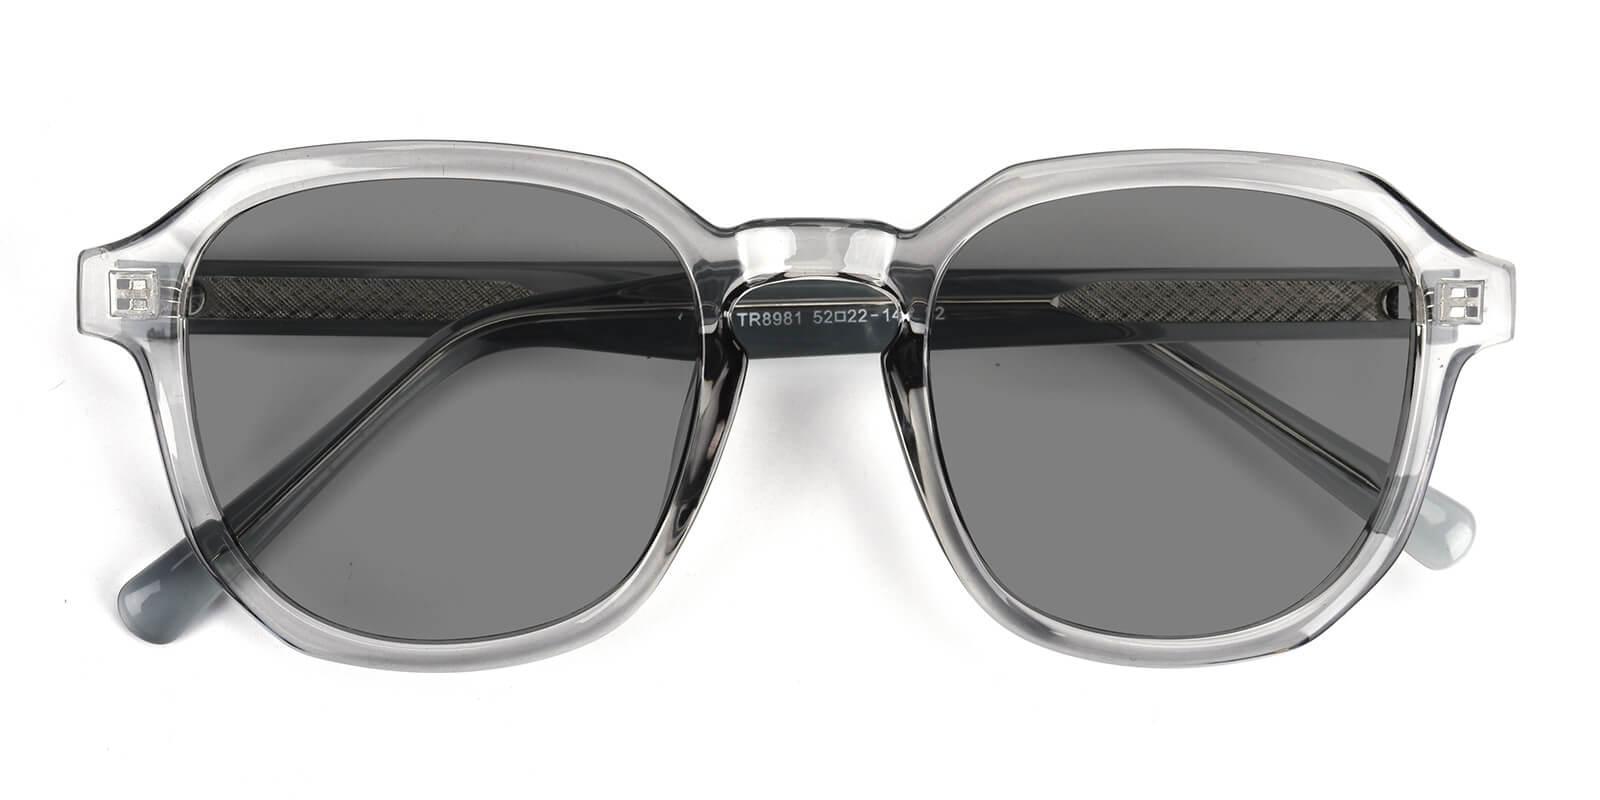 Polly-Gray-Square-Acetate-Eyeglasses-detail